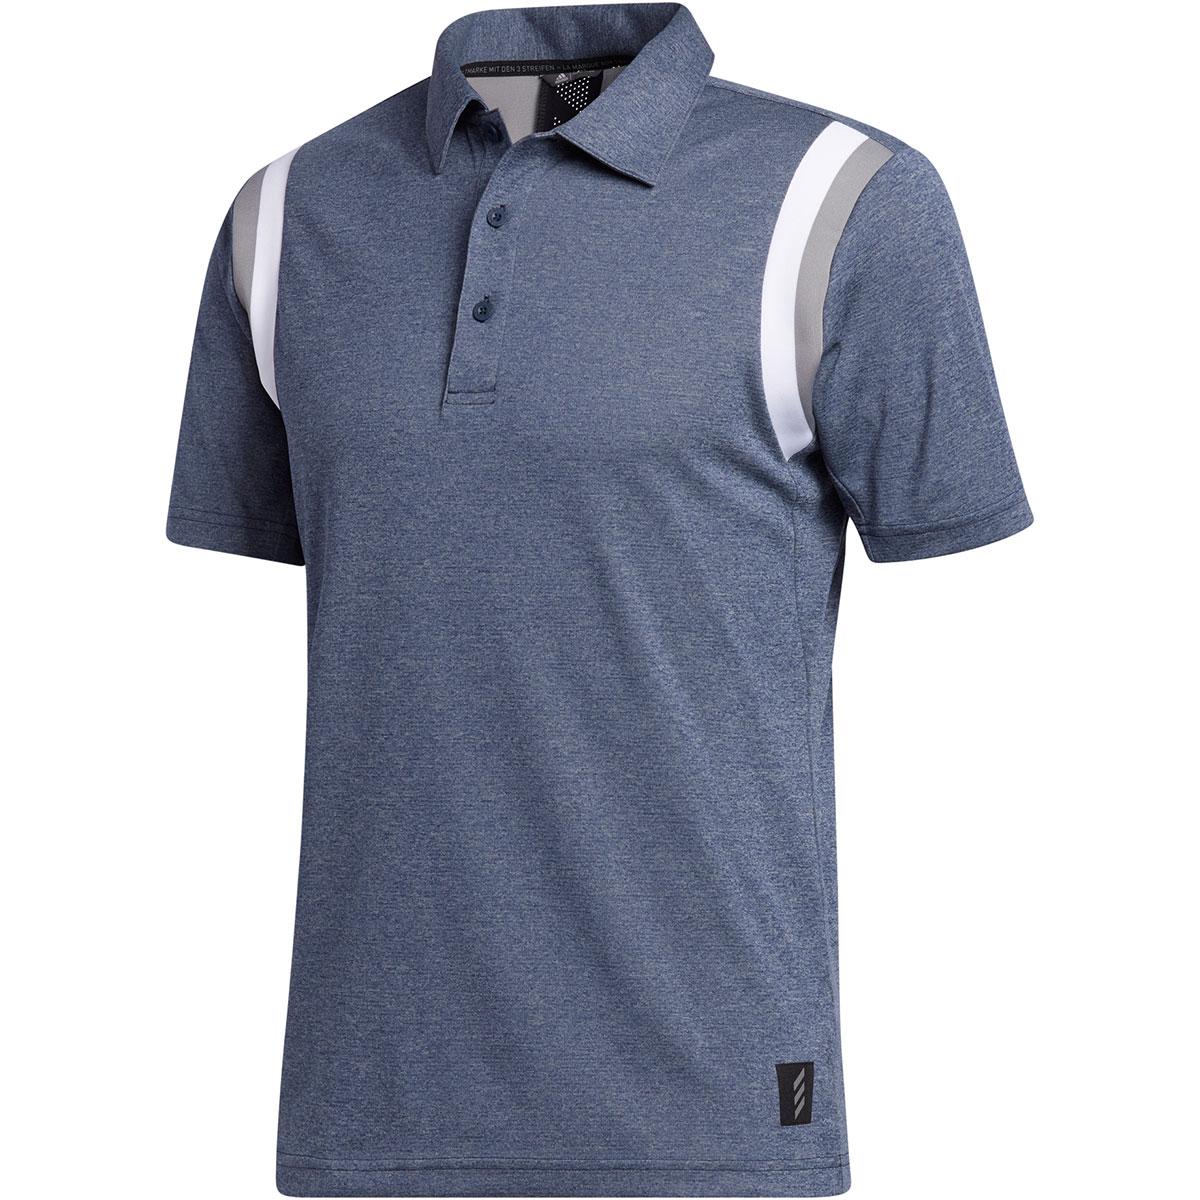 ADICROSS ラインド半袖ポロシャツ